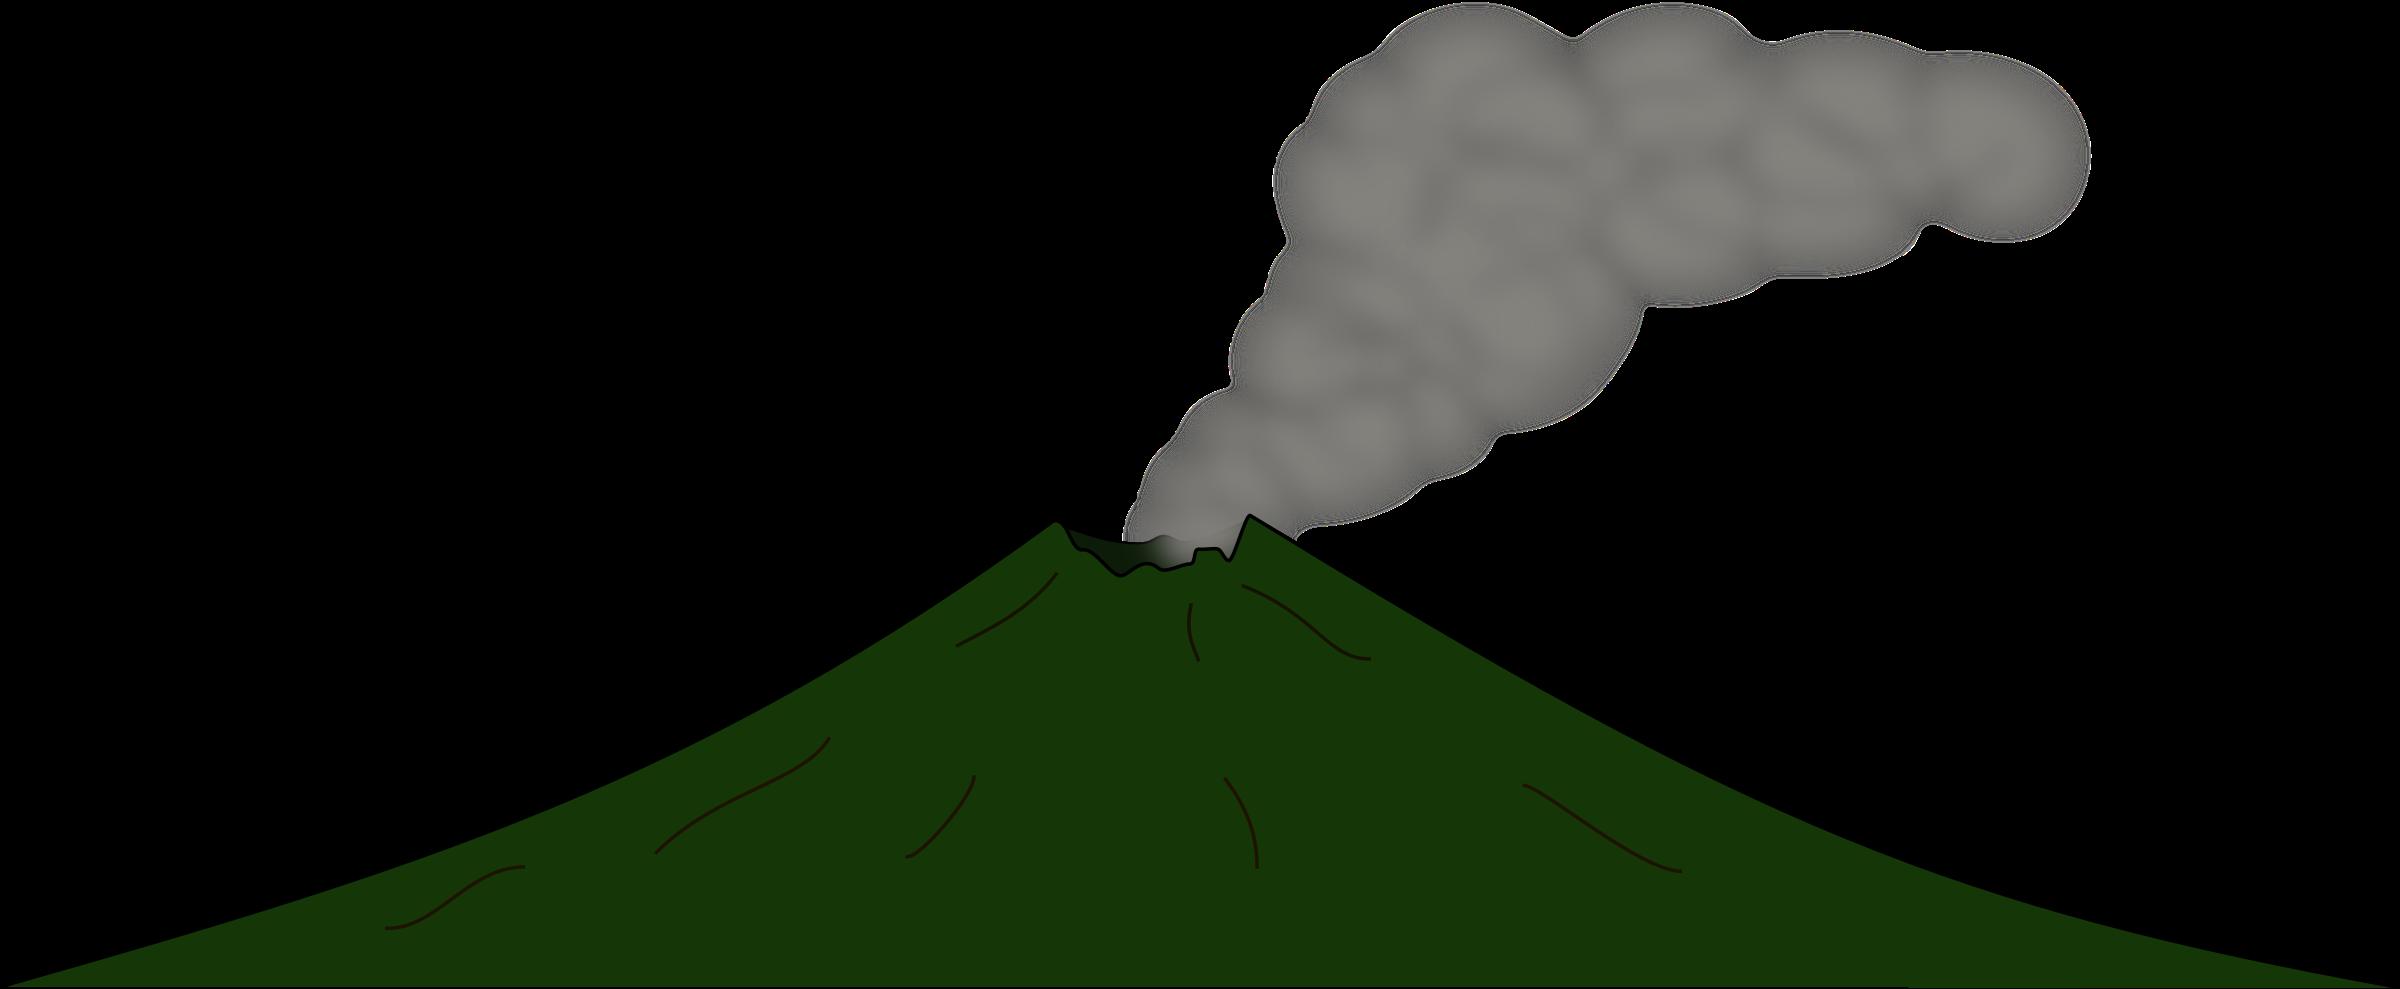 Clipart volcano 2